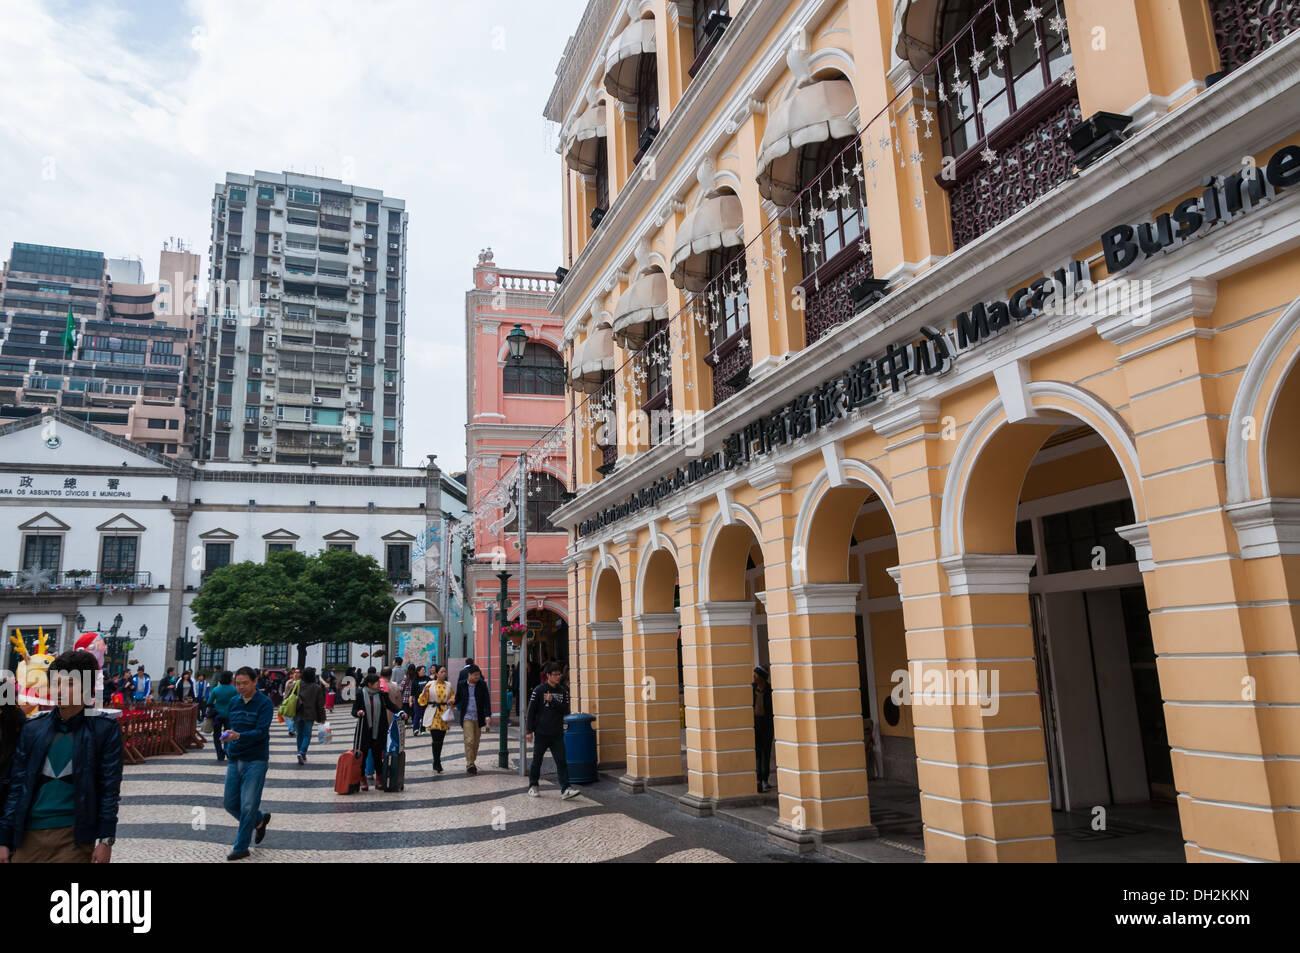 Tourists and shoppers wander around Senado Square in Macau, China. - Stock Image